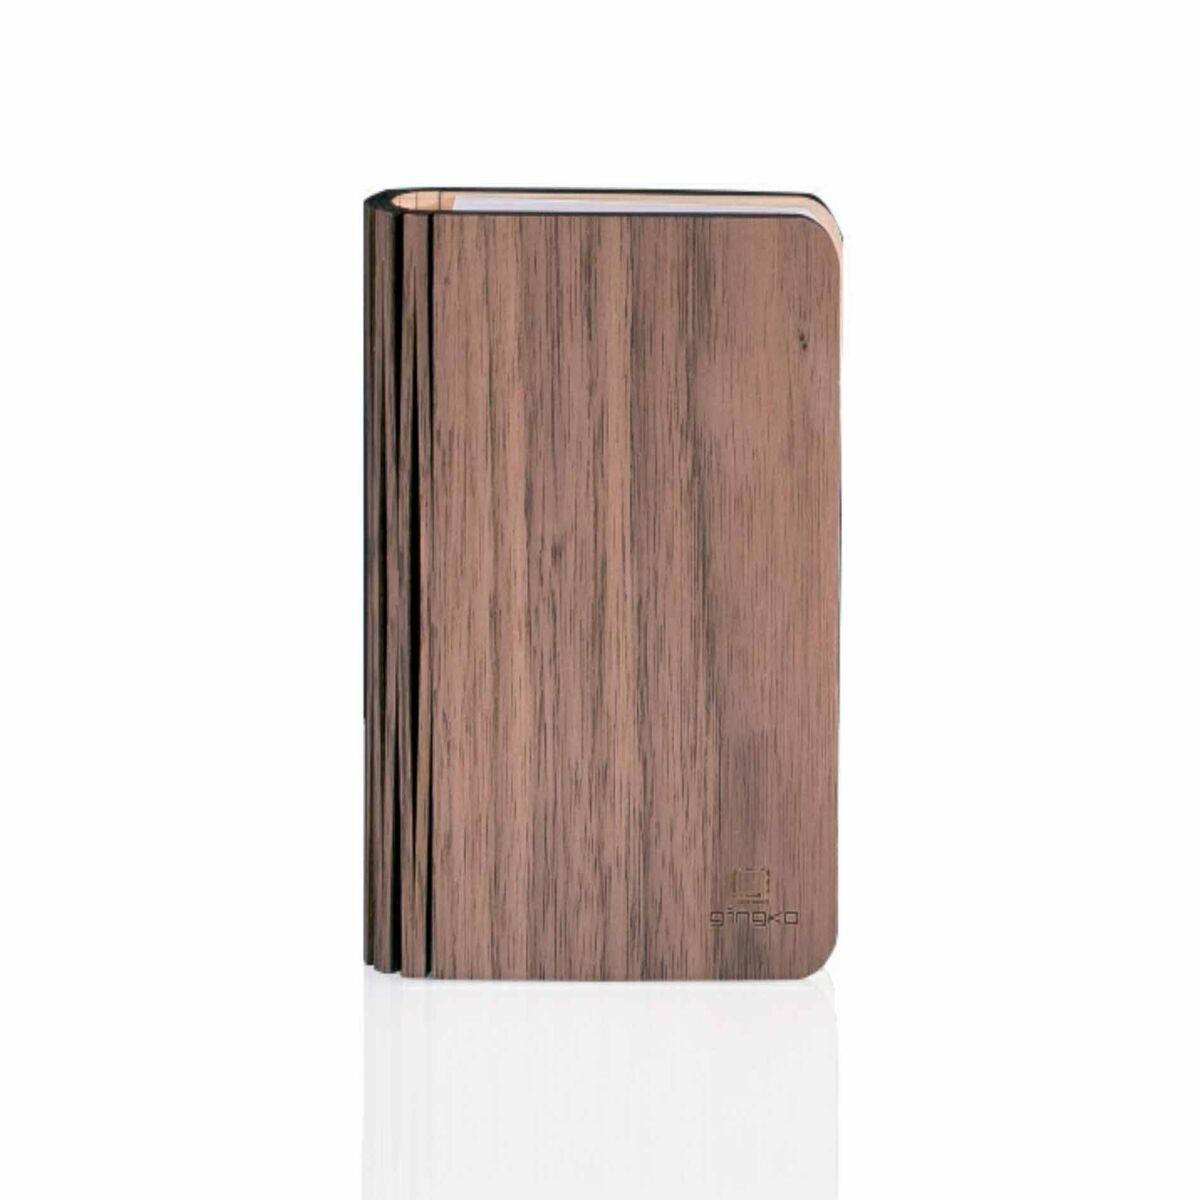 Gingko Smart Wood Book Light